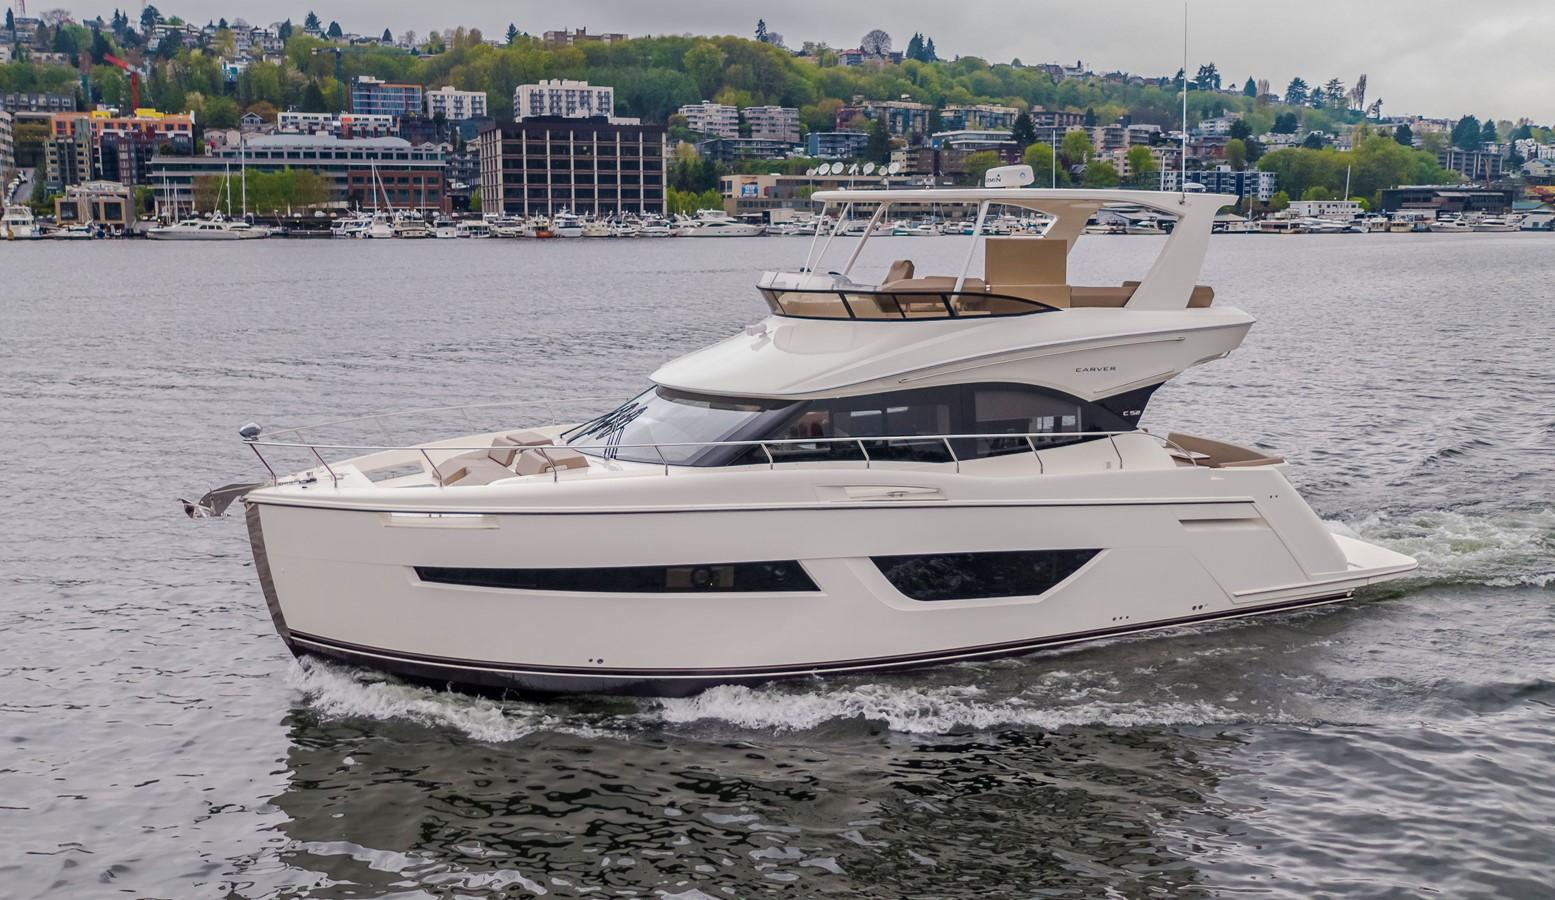 2019 CARVER C52 Motor Yacht 2520775